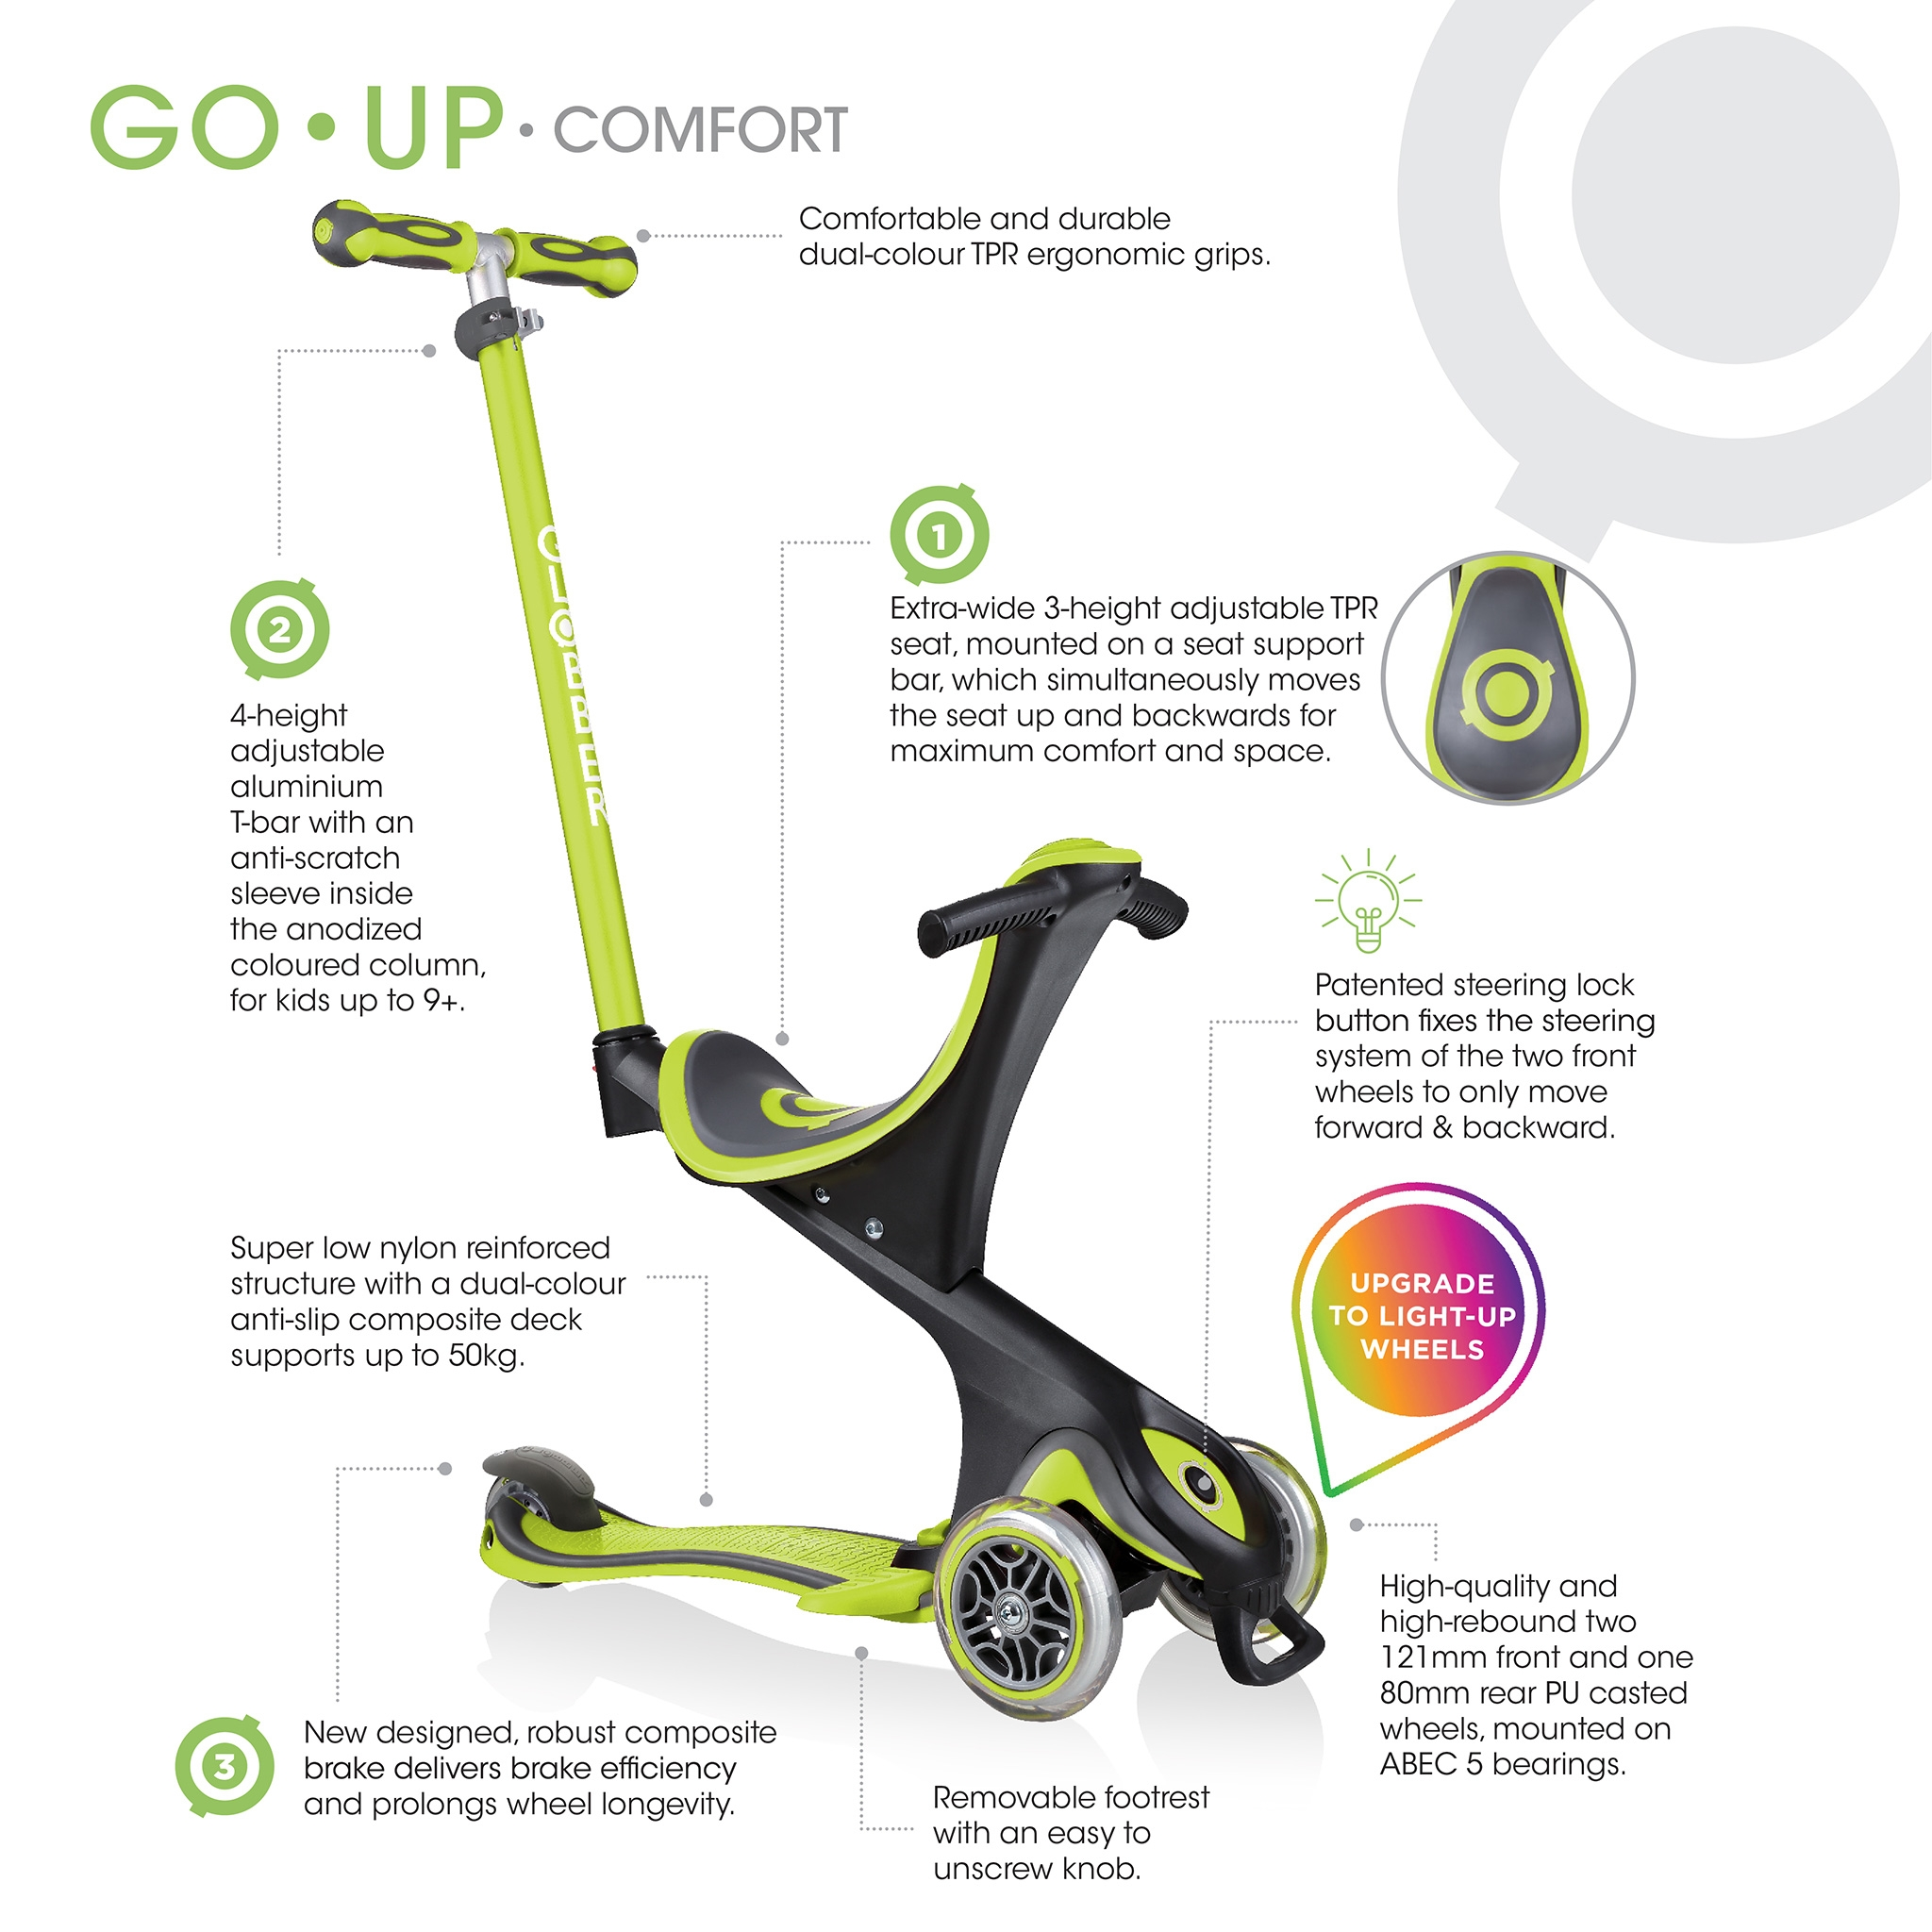 GO-UP-COMFORT-LIGHTS 1